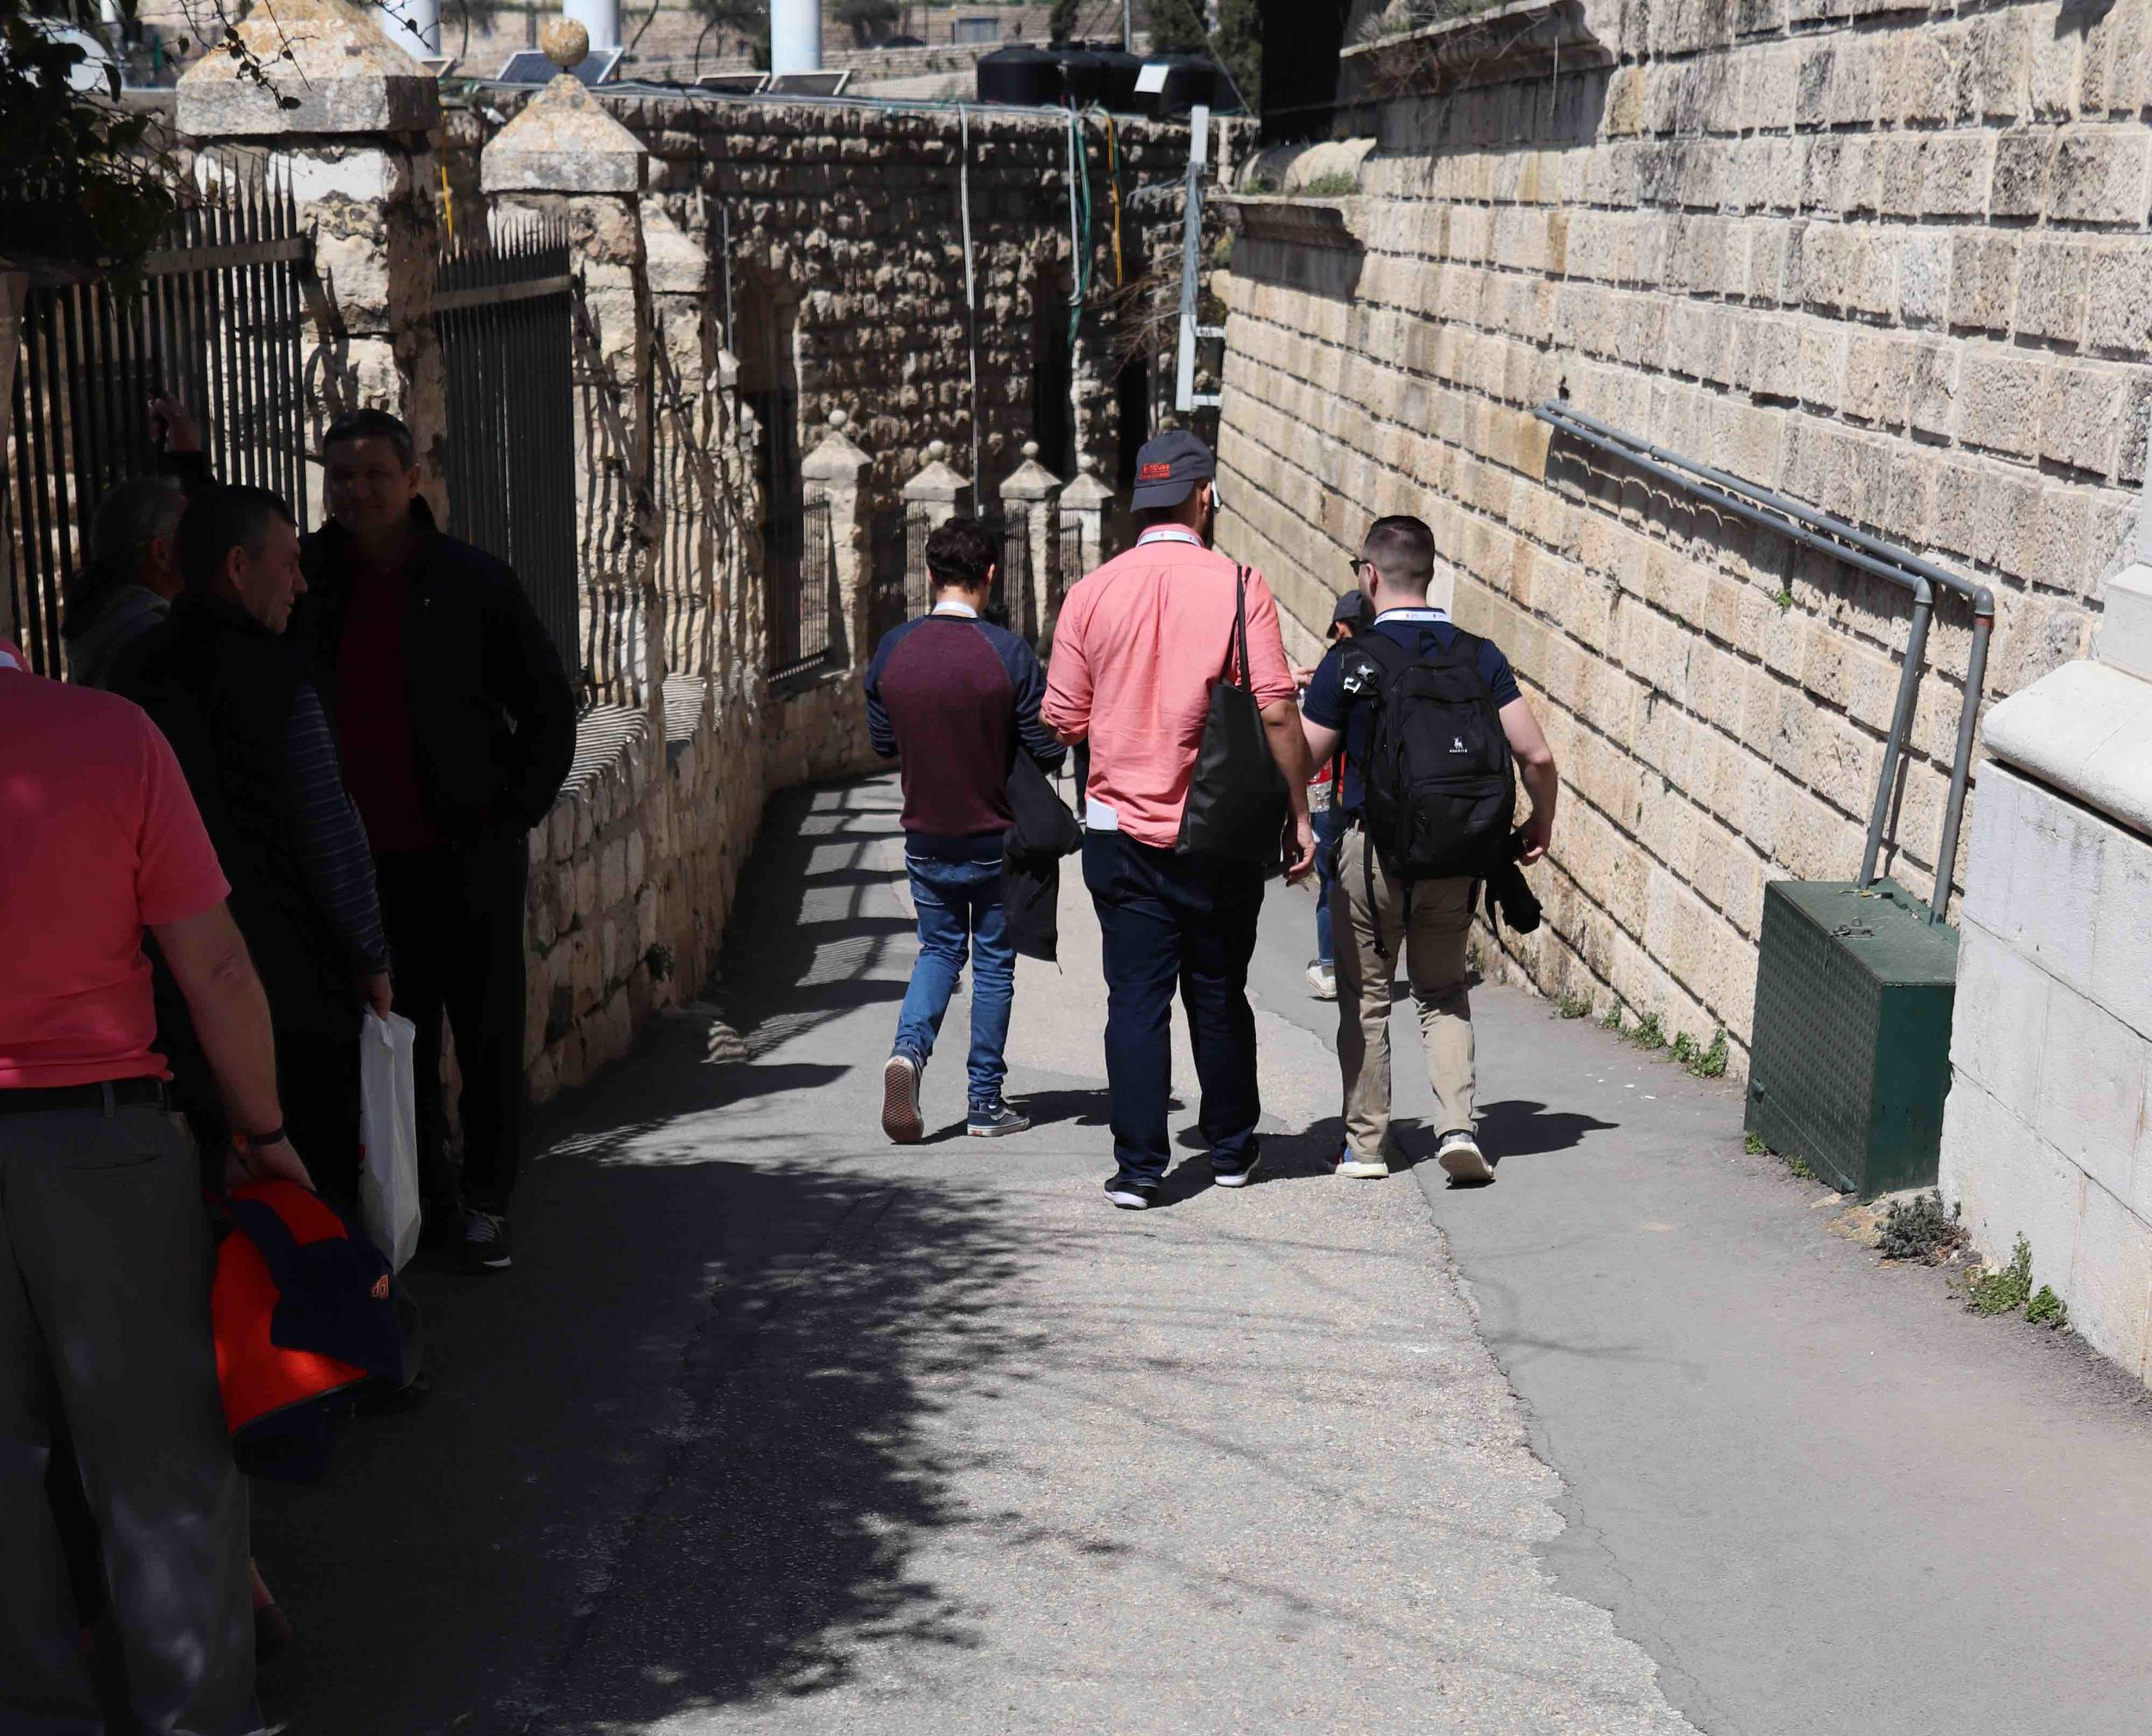 Walking the street Jesus took to enter Jerusalem the week before he was crucified.